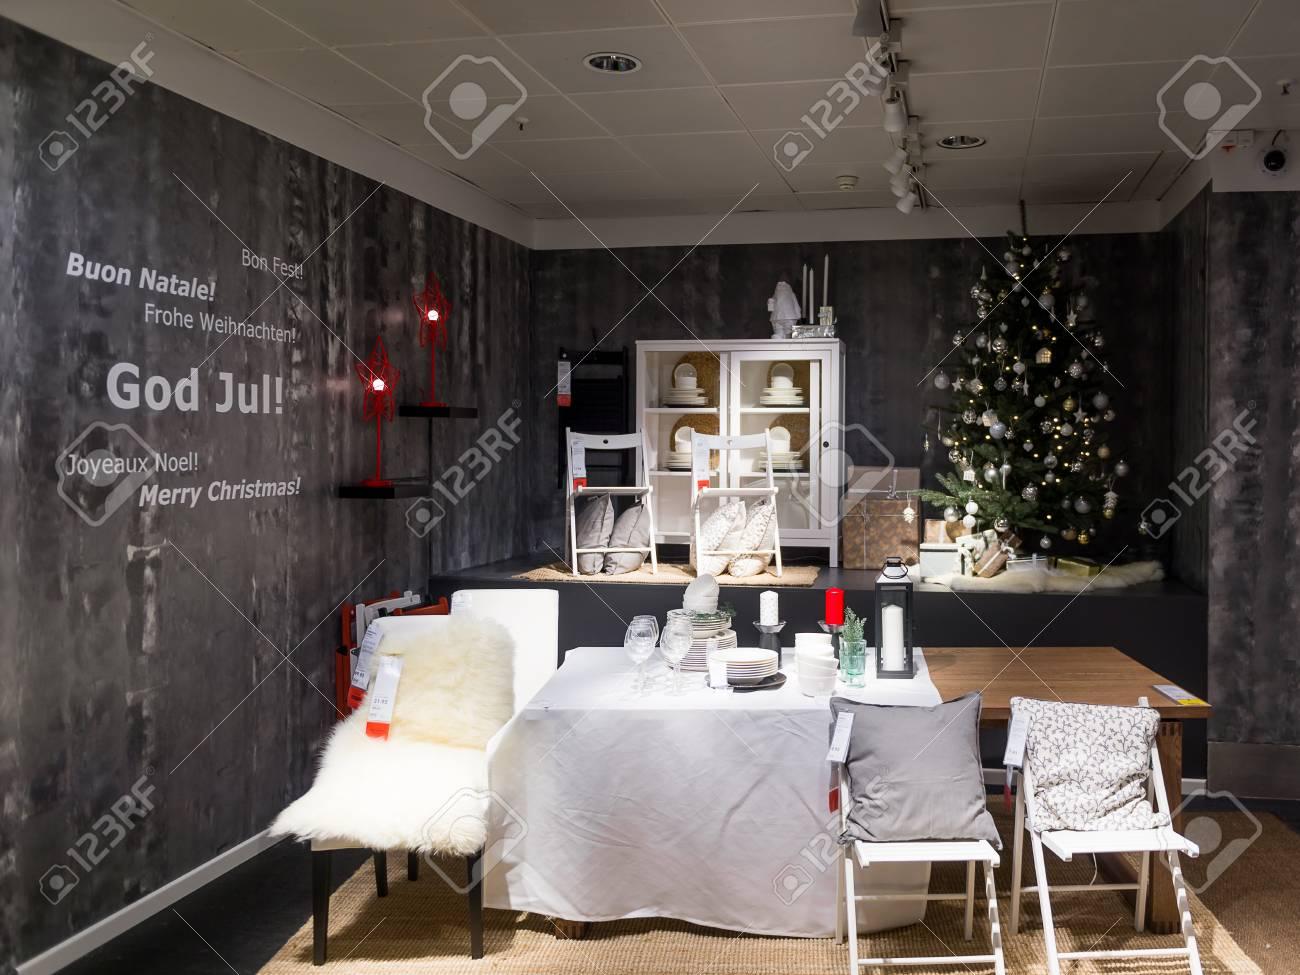 Ikea Weihnachten.Lugano Switzerland Nov 4 2017 Christmas Table Ikea Shop